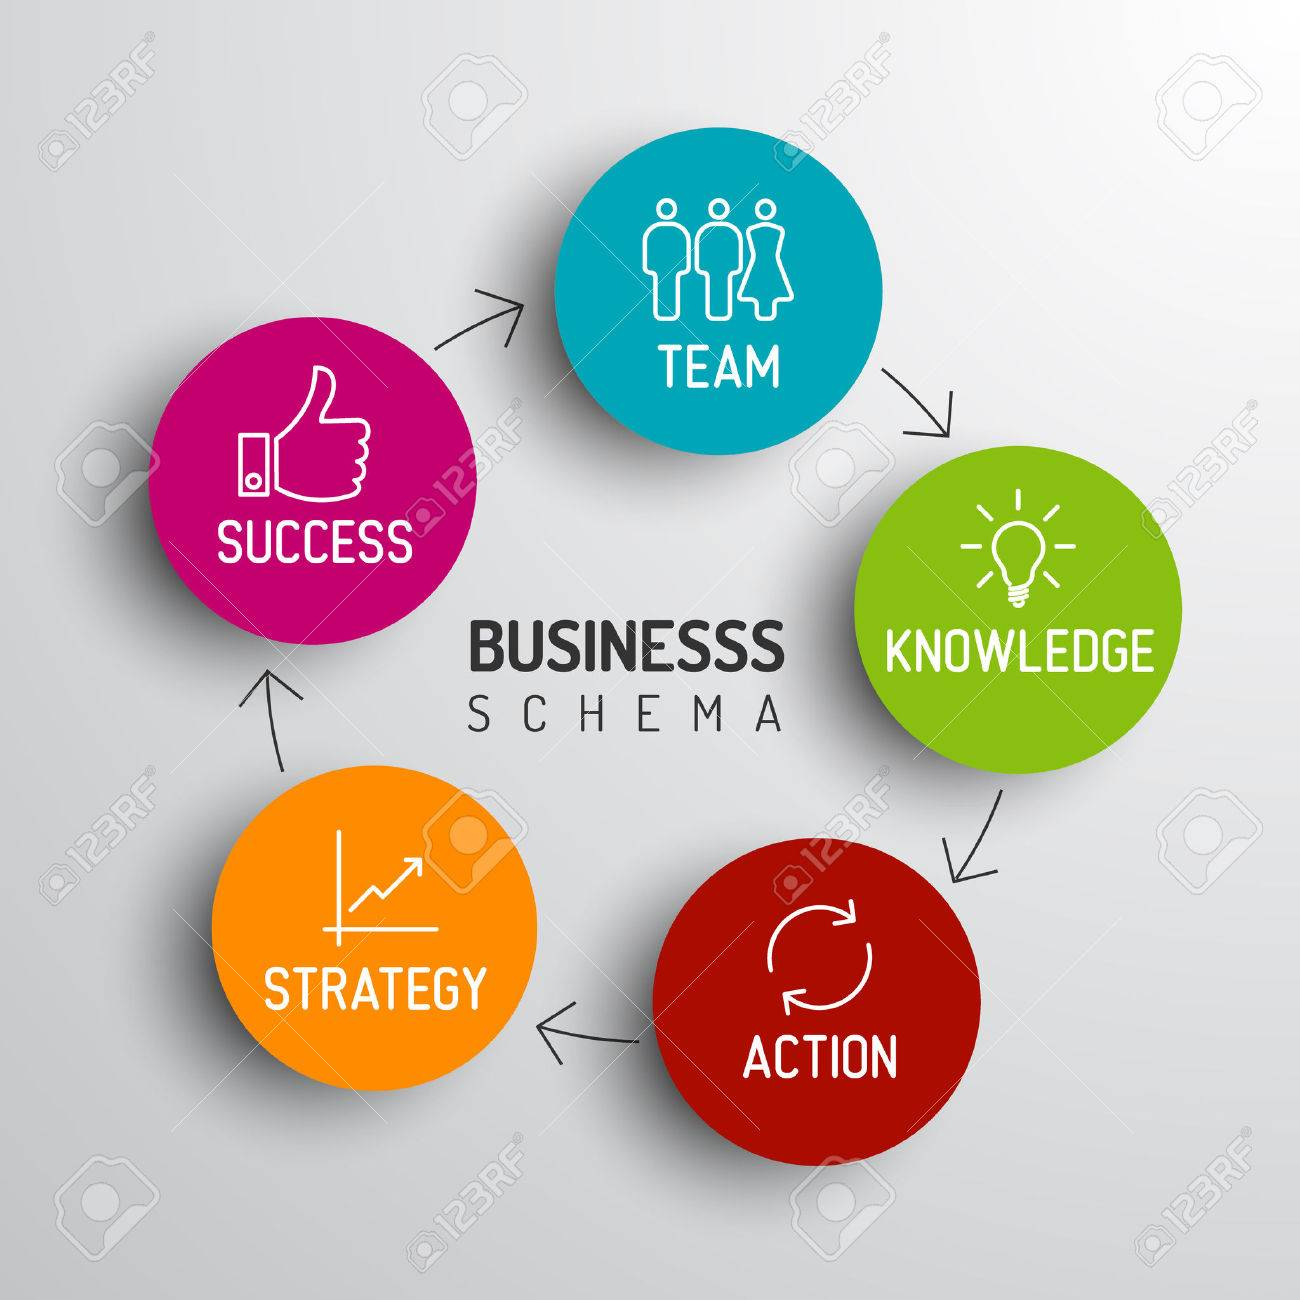 Minimalistic business schema diagram royalty free cliparts vetores imagens minimalistic business schema diagram ccuart Image collections